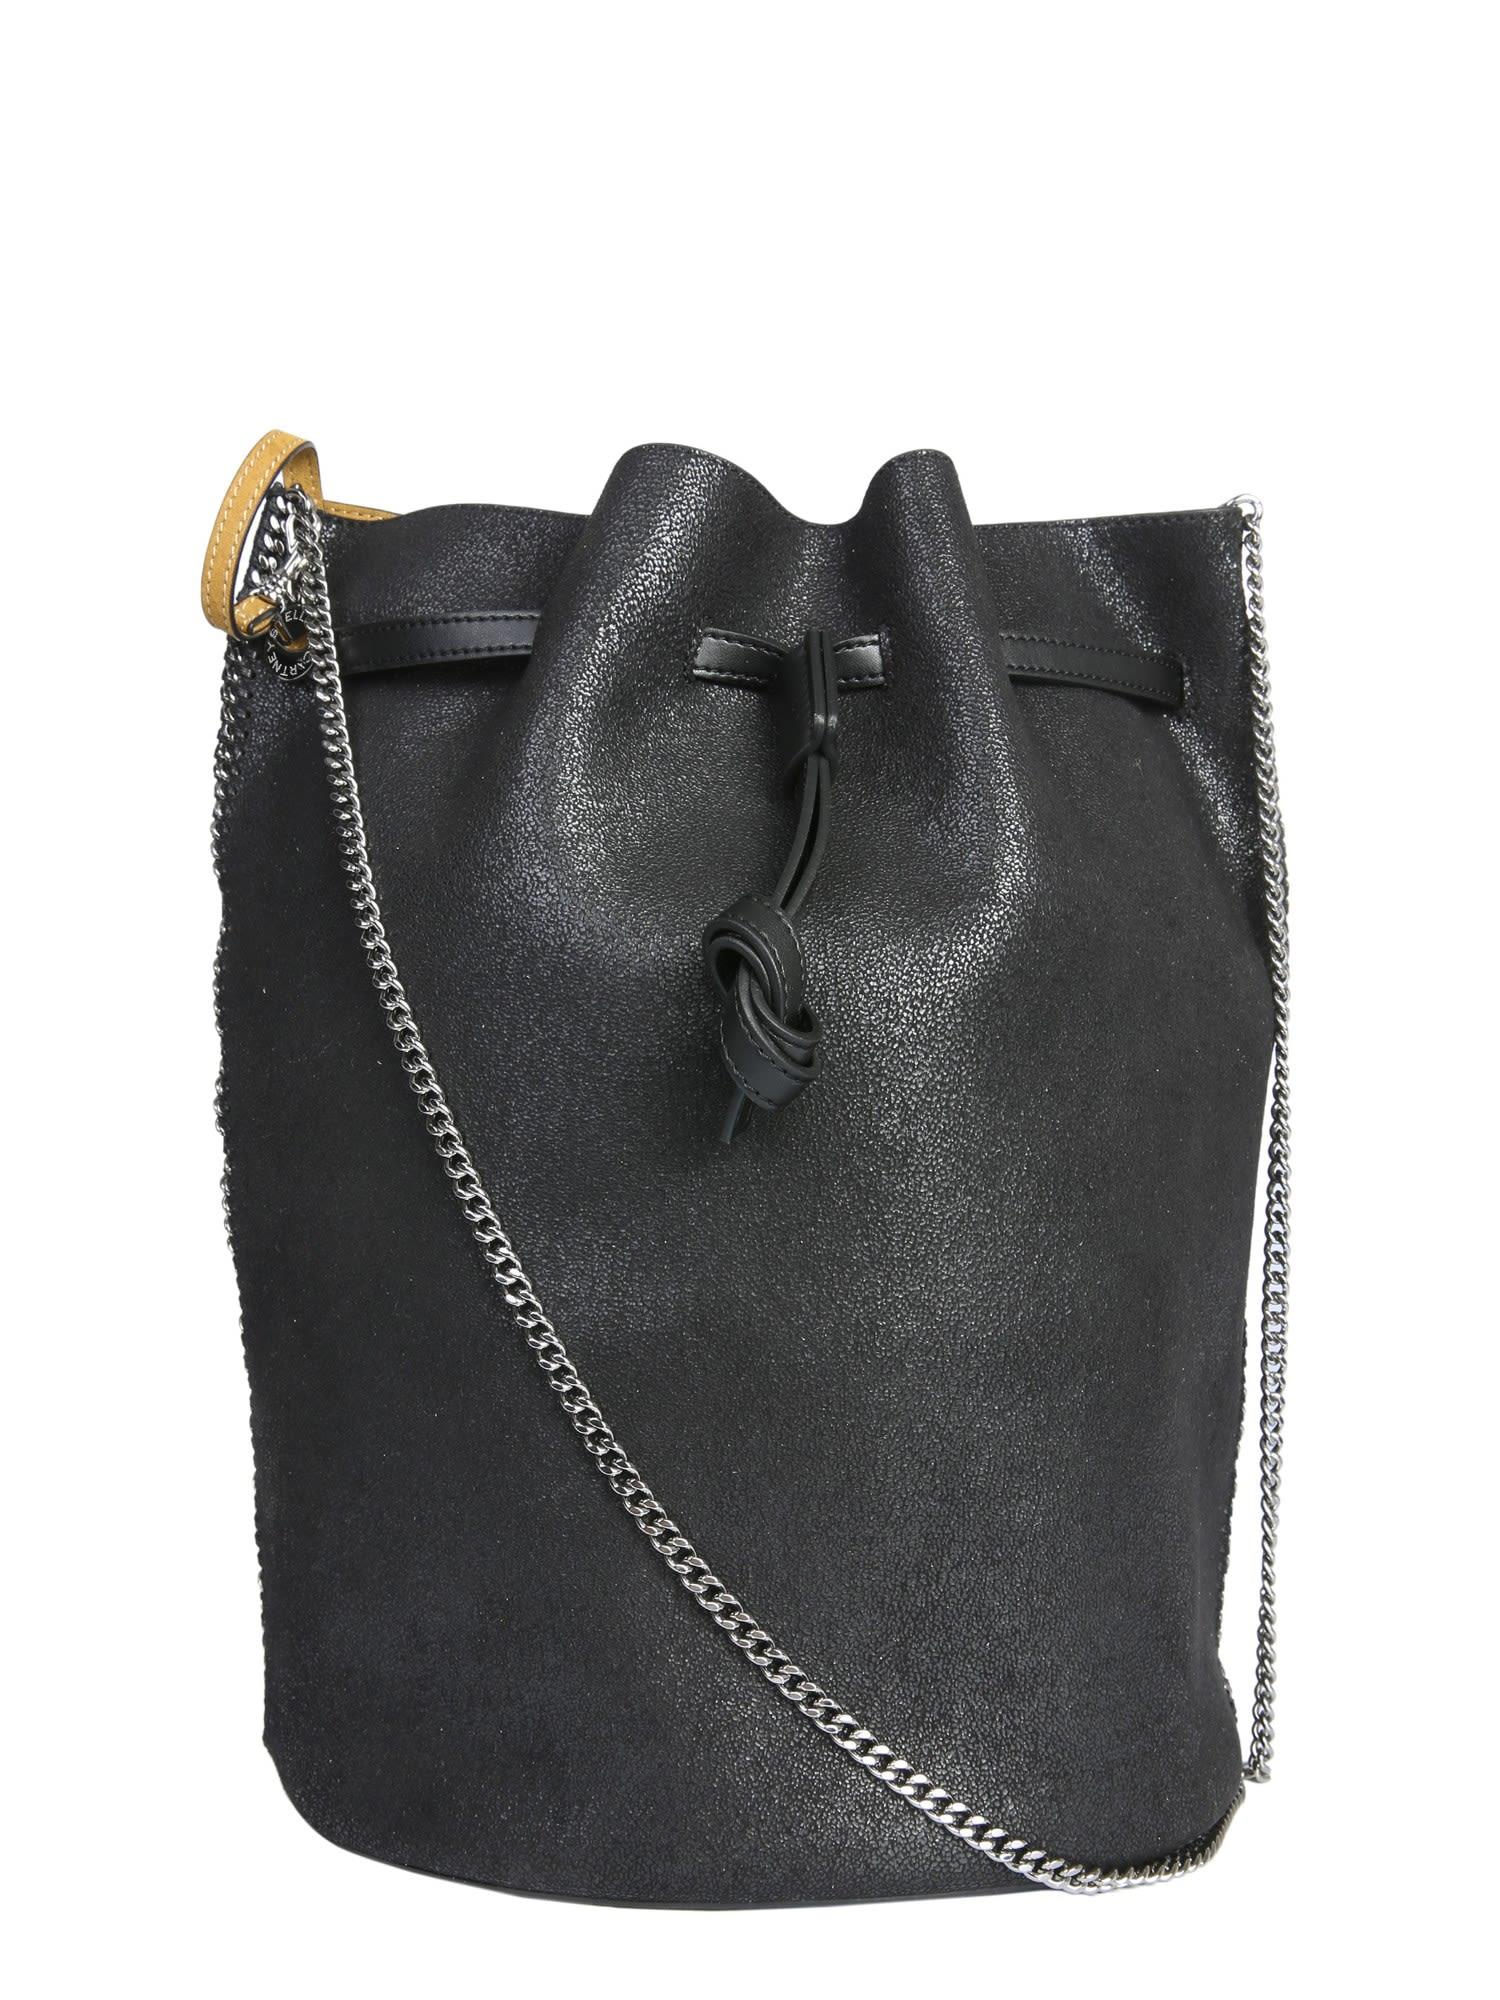 Stella McCartney Medium Belted Bucket Bag